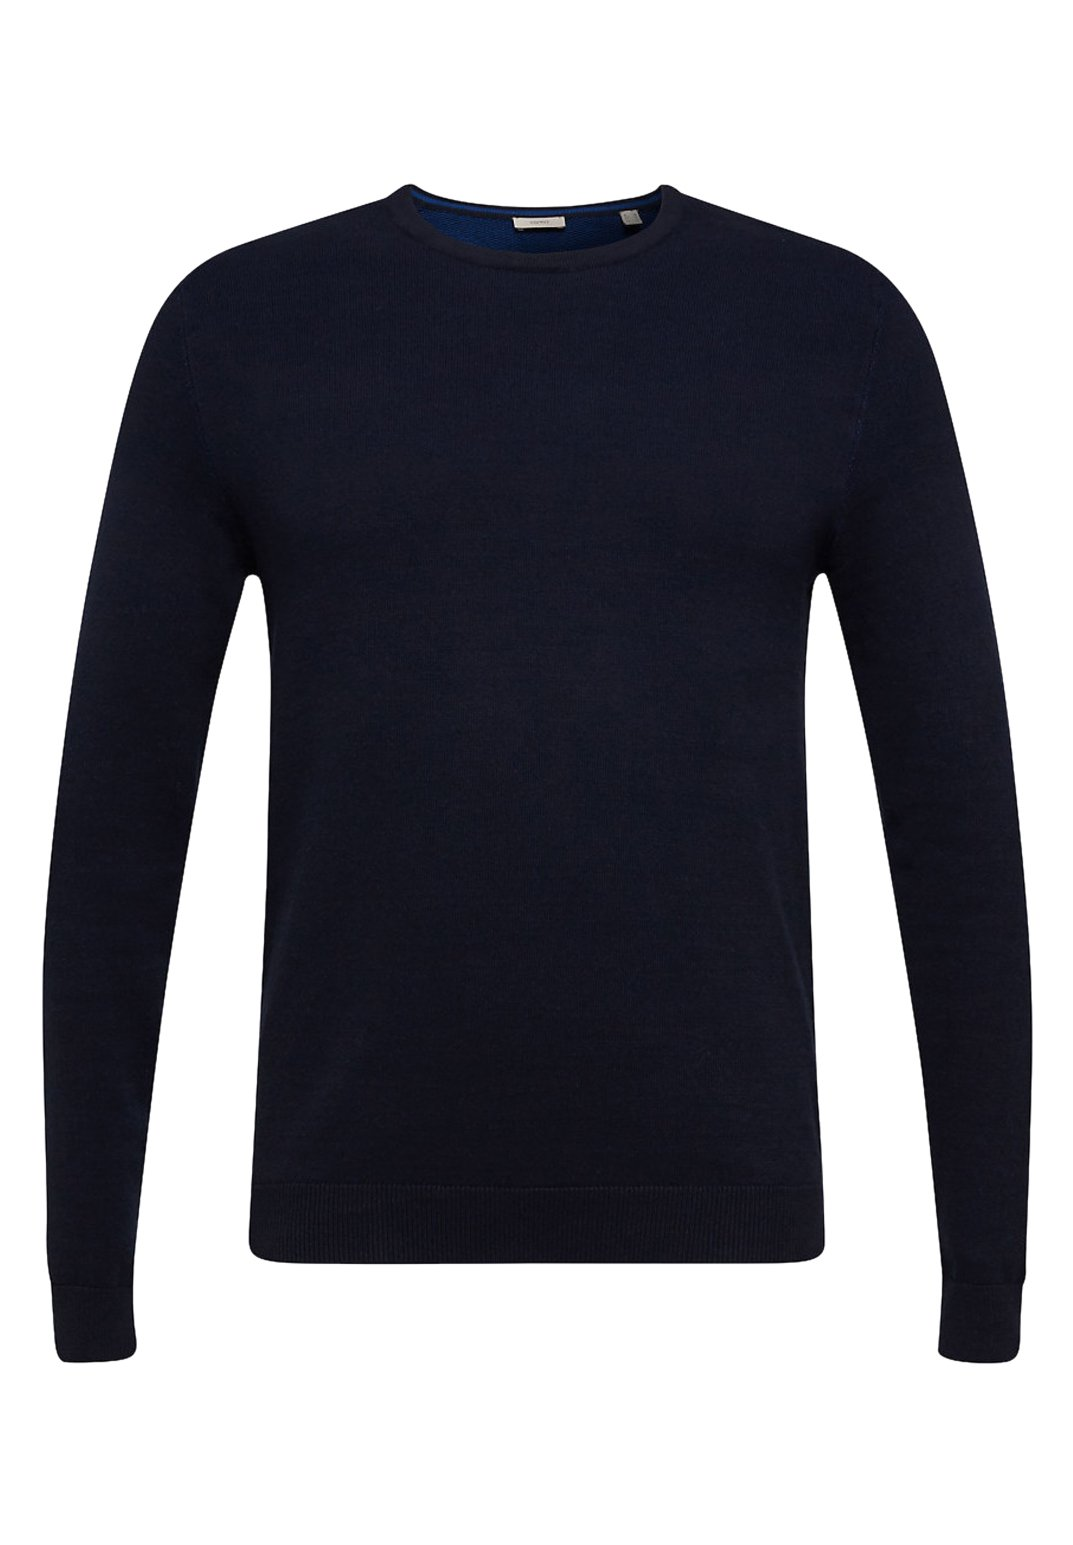 Esprit Sweatshirts - Navy